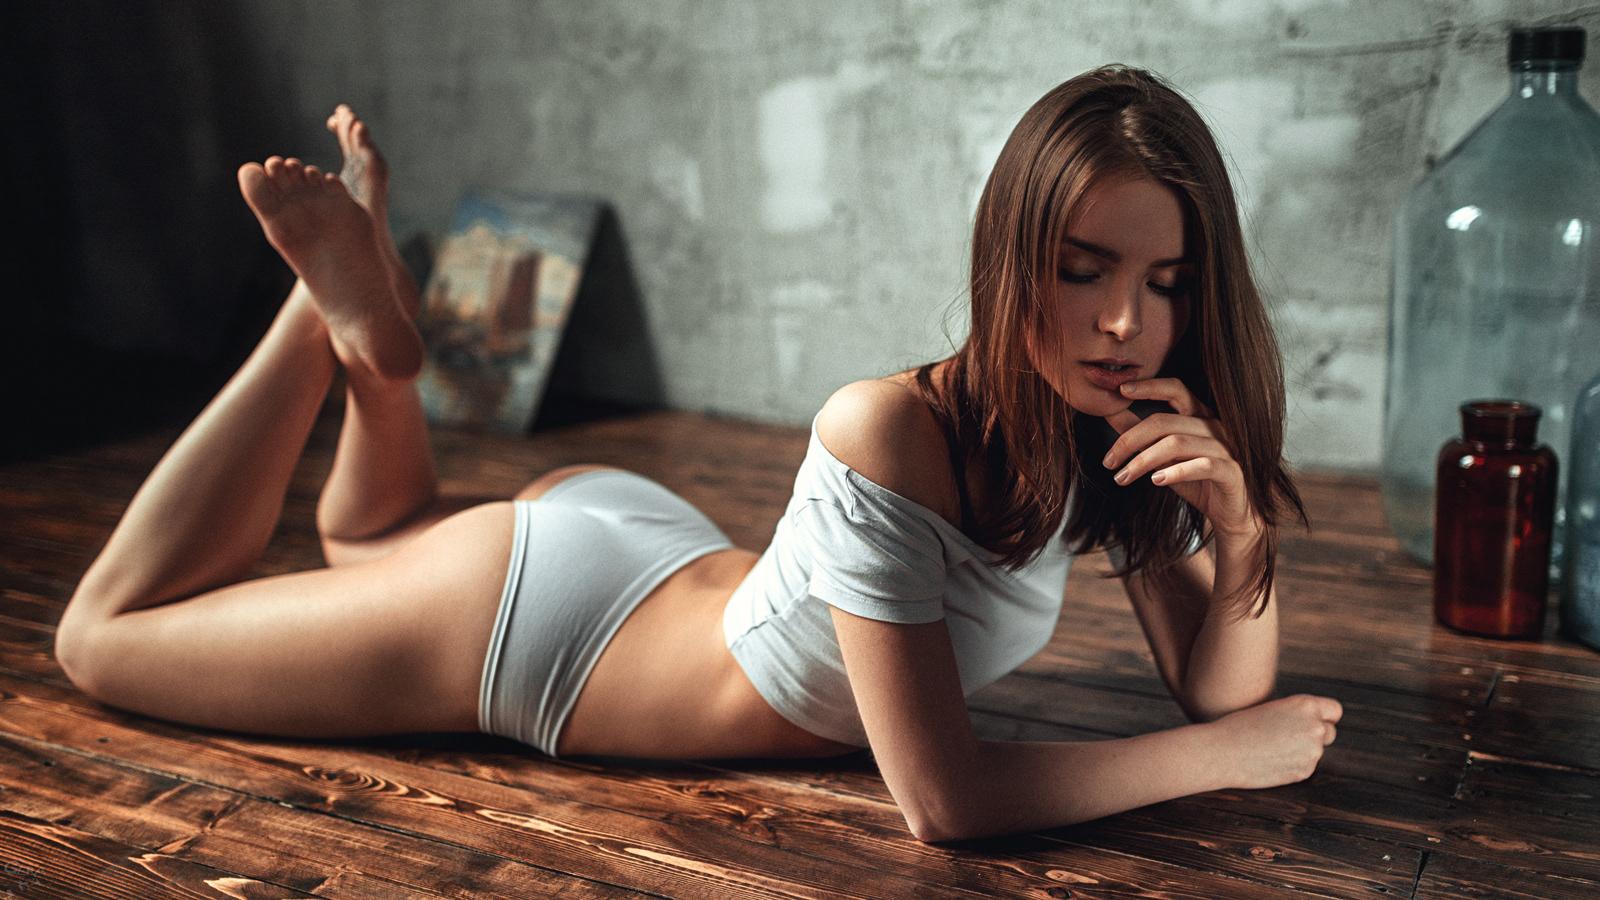 Luxury And Sensitive Teen Pornstar Sex Picture Porn Pics